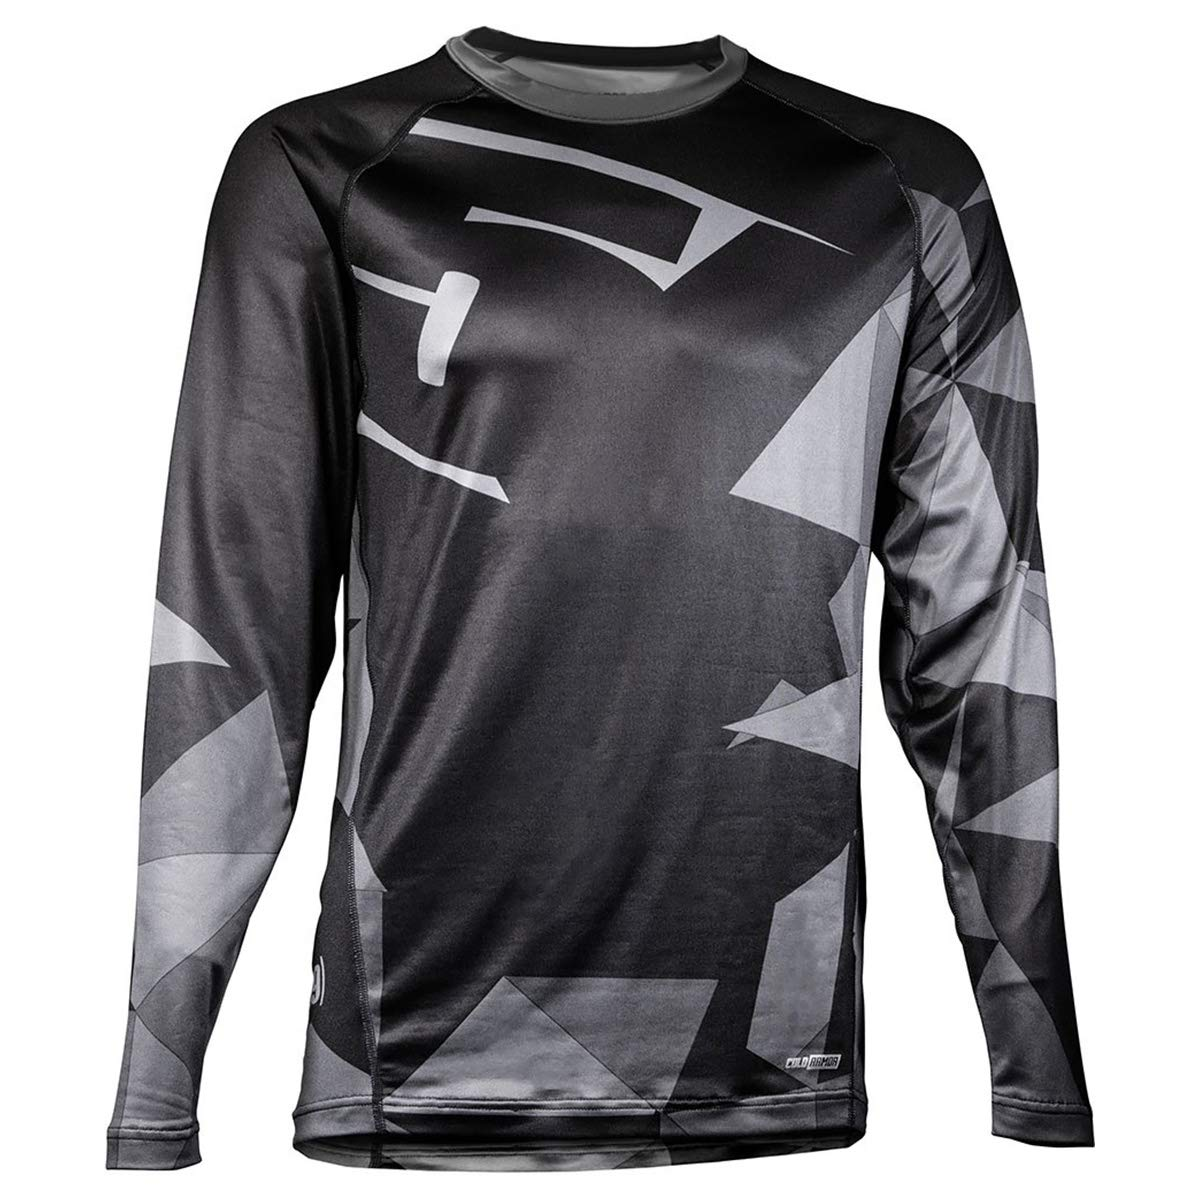 509 FZN LVL 1 Shirt (Black Ops - Medium)